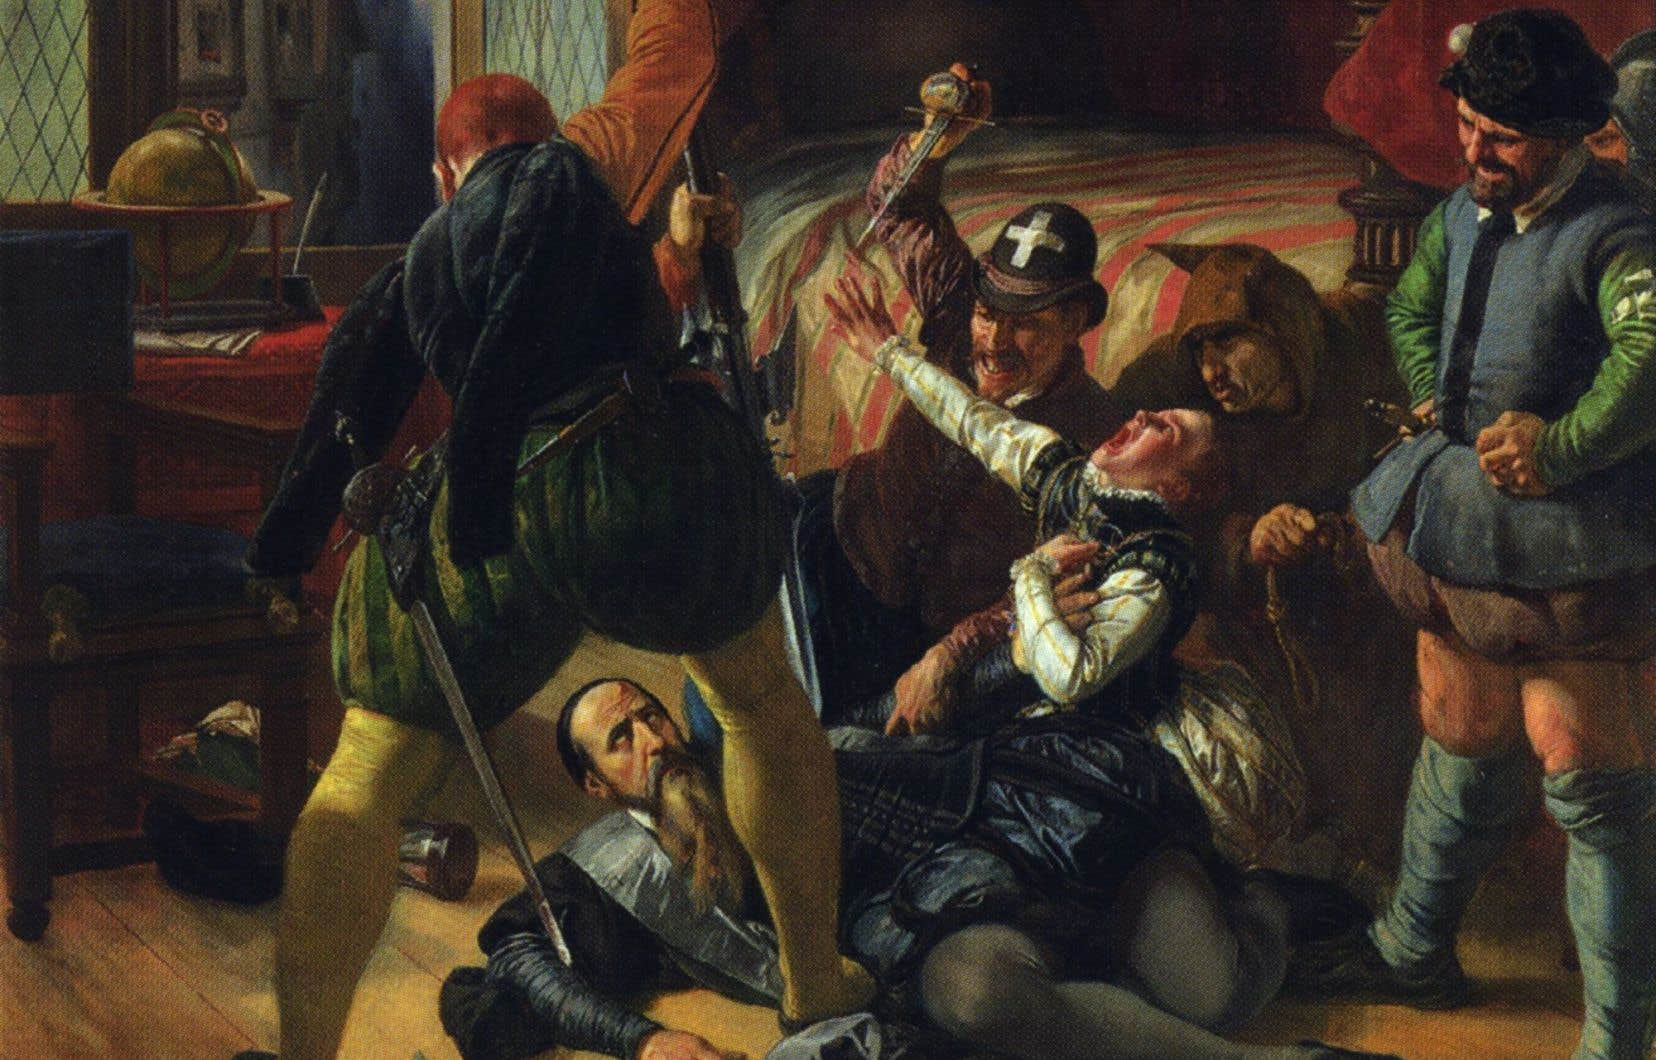 «Scène de la Saint-Barthélemy», Joseph-Nicolas Robert-Fleury, 1833.